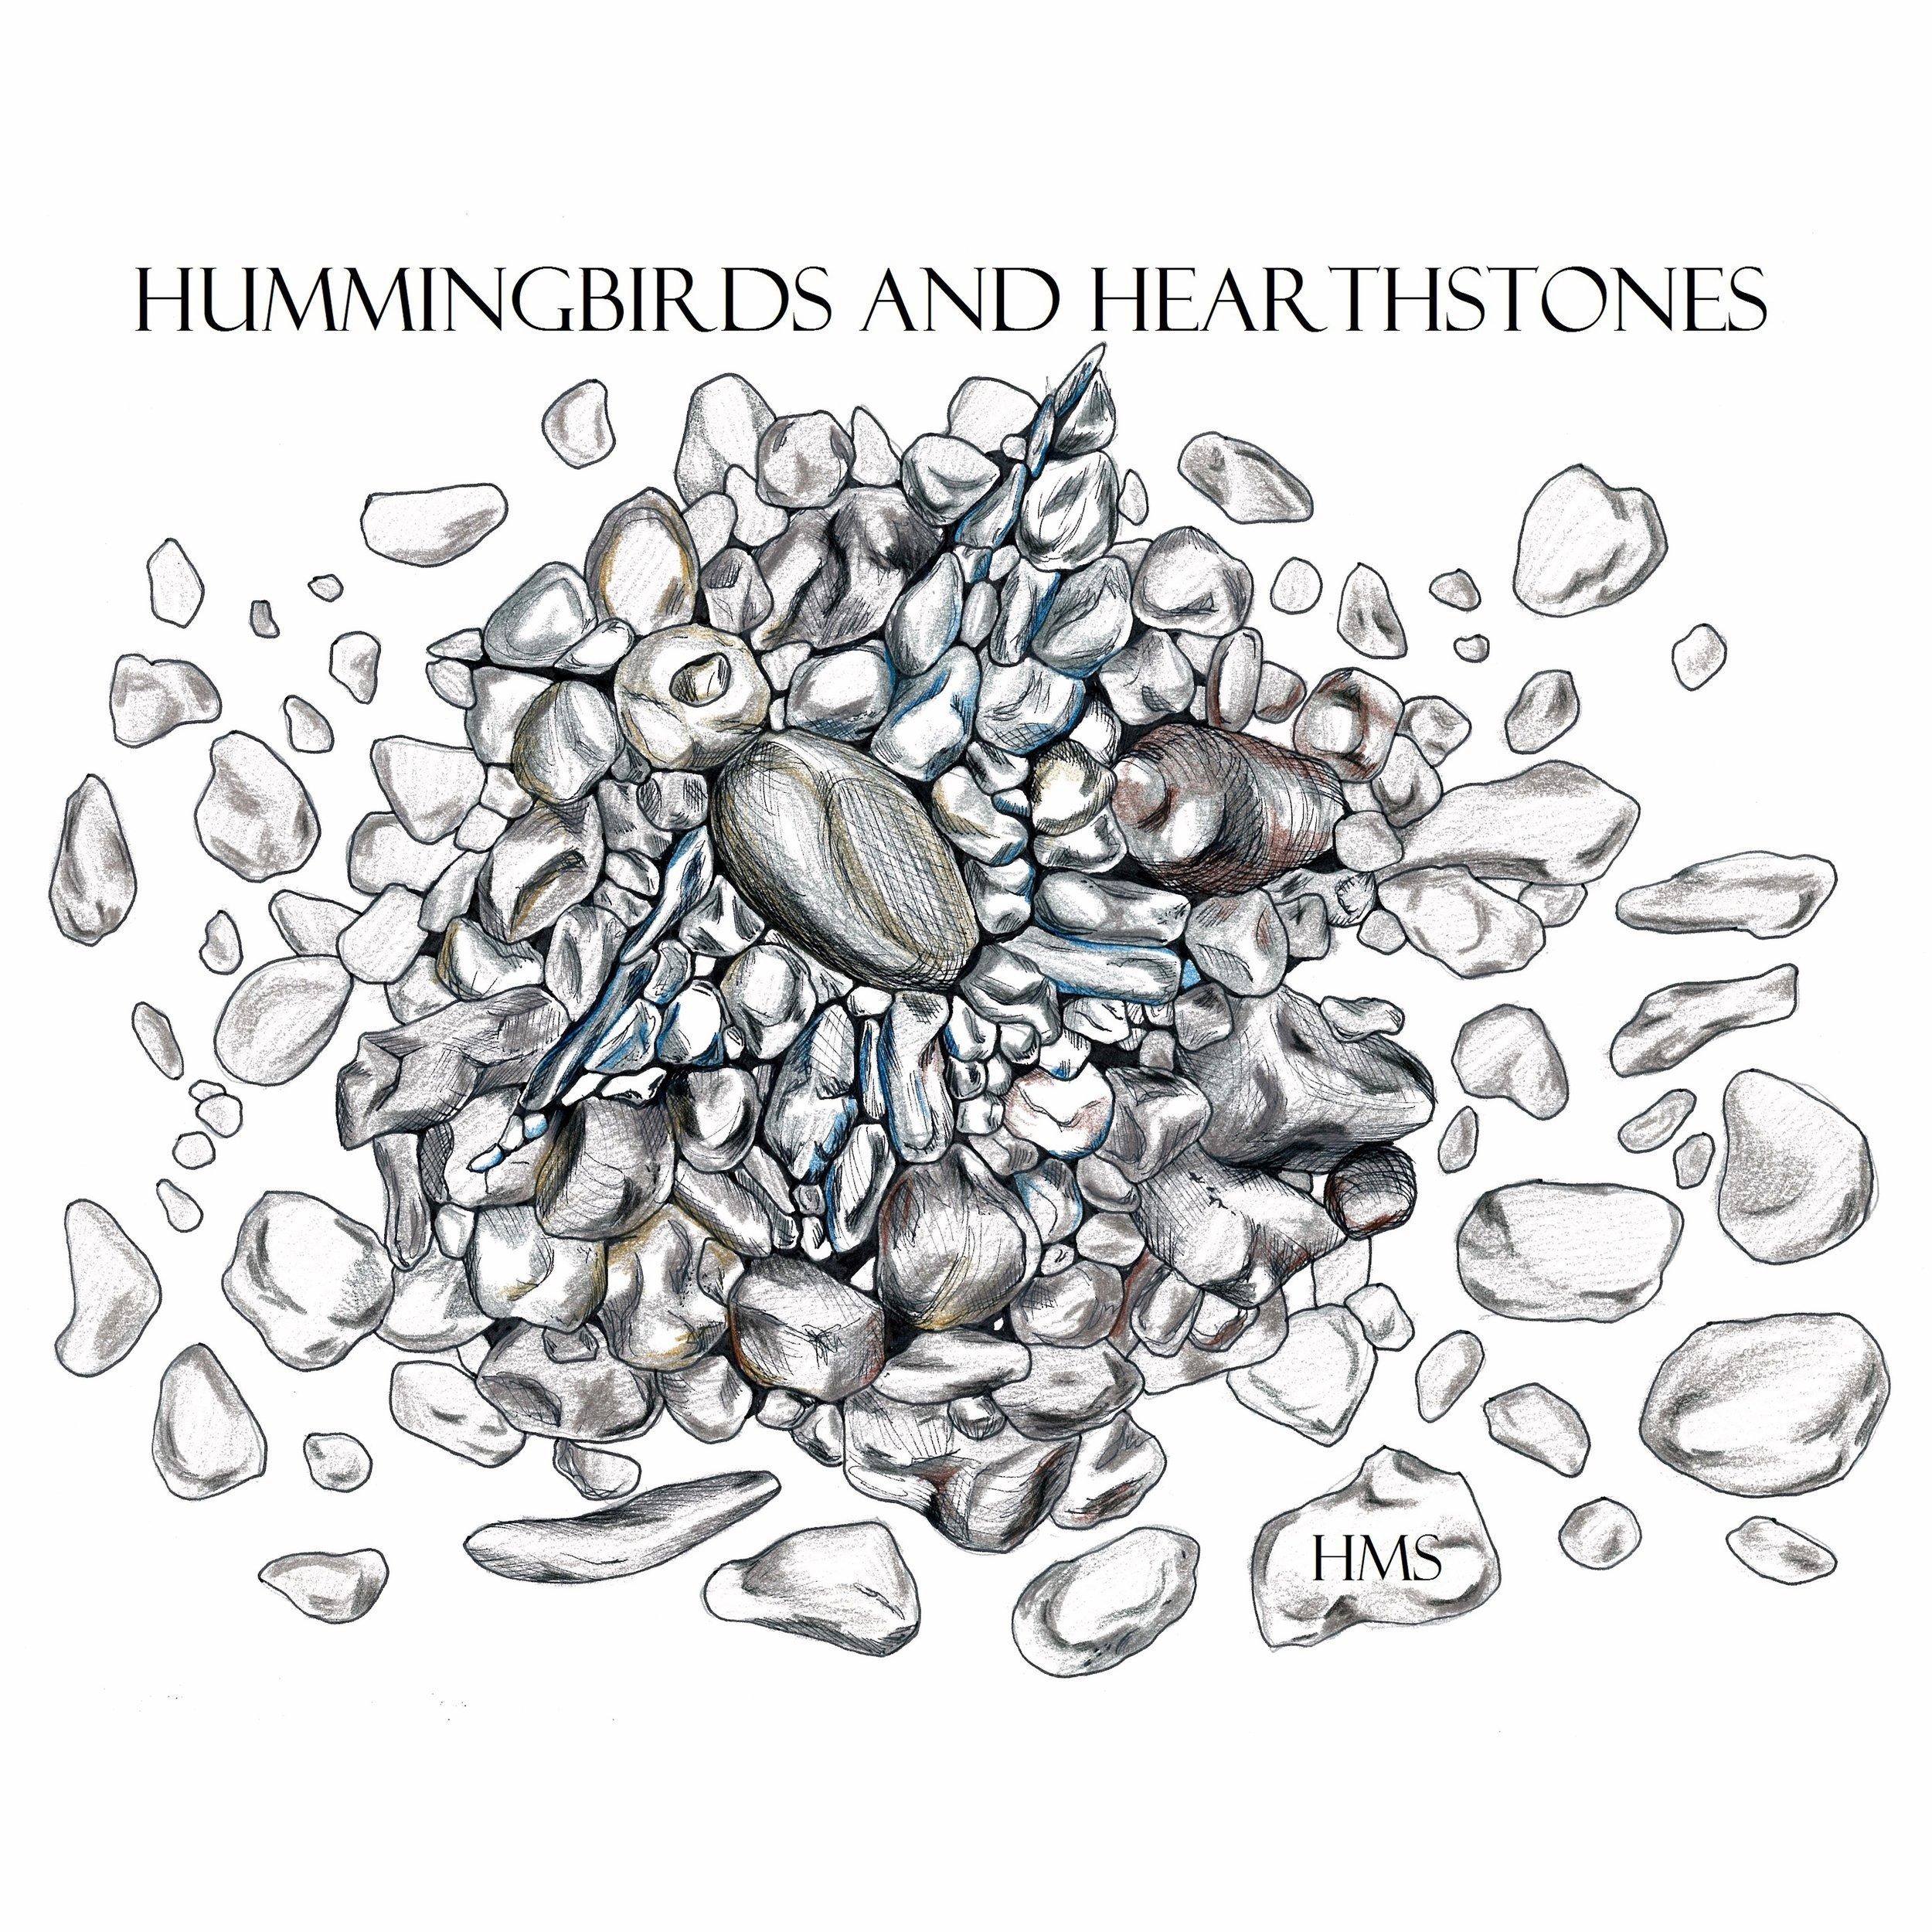 Heather Sommerlad -  Hummingbirds and Hearthstones  (2016)